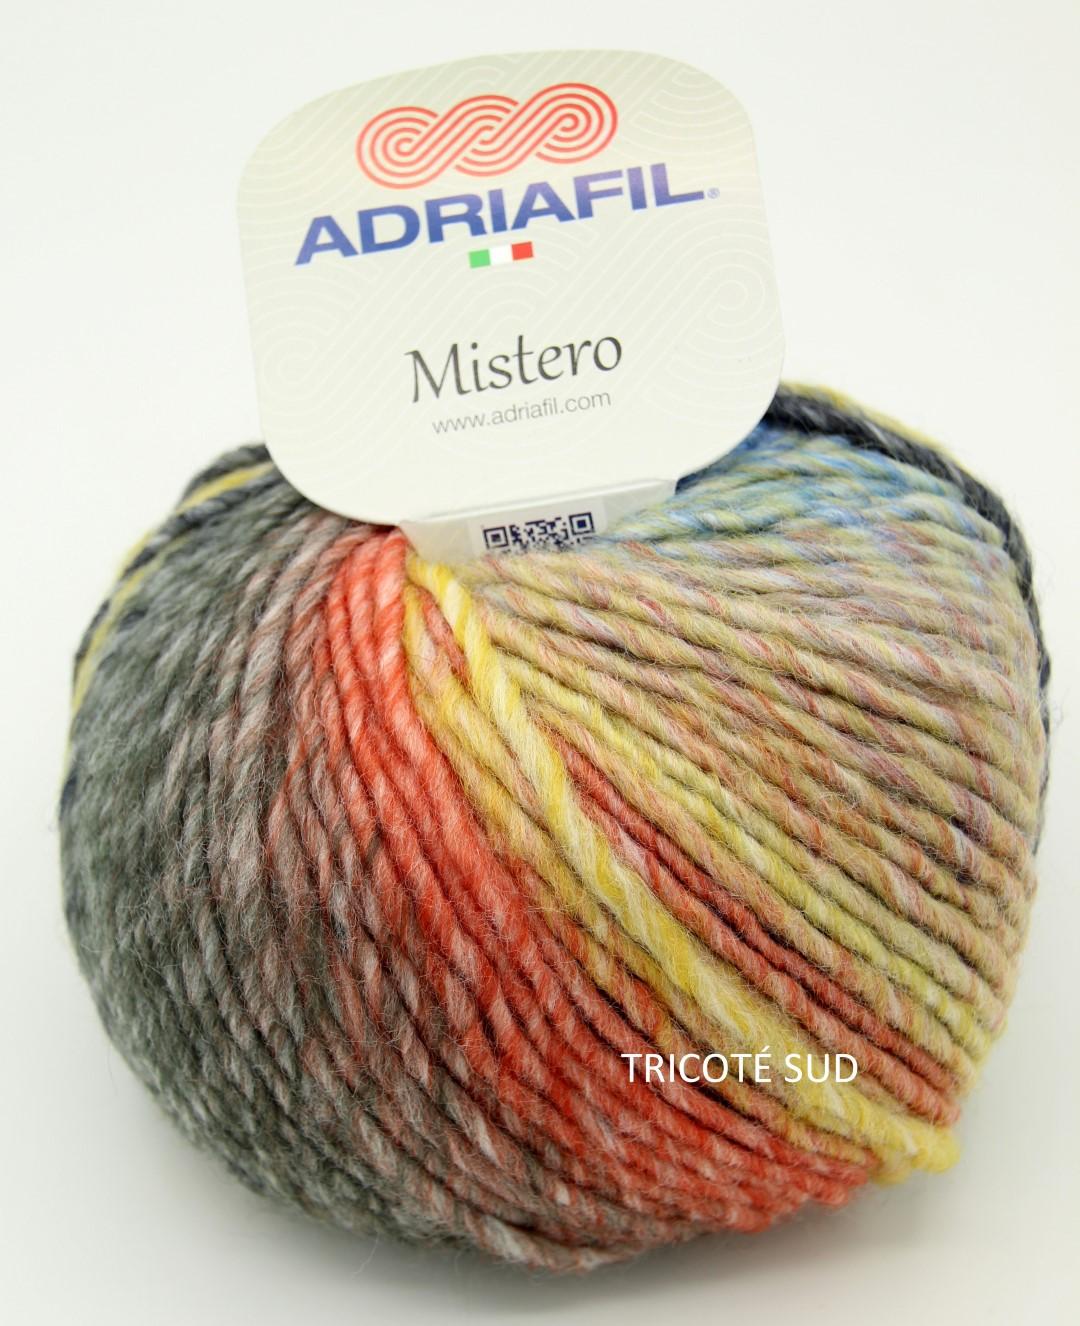 MISTERO ADRIAFIL COLORIS 52 (2) (Large)